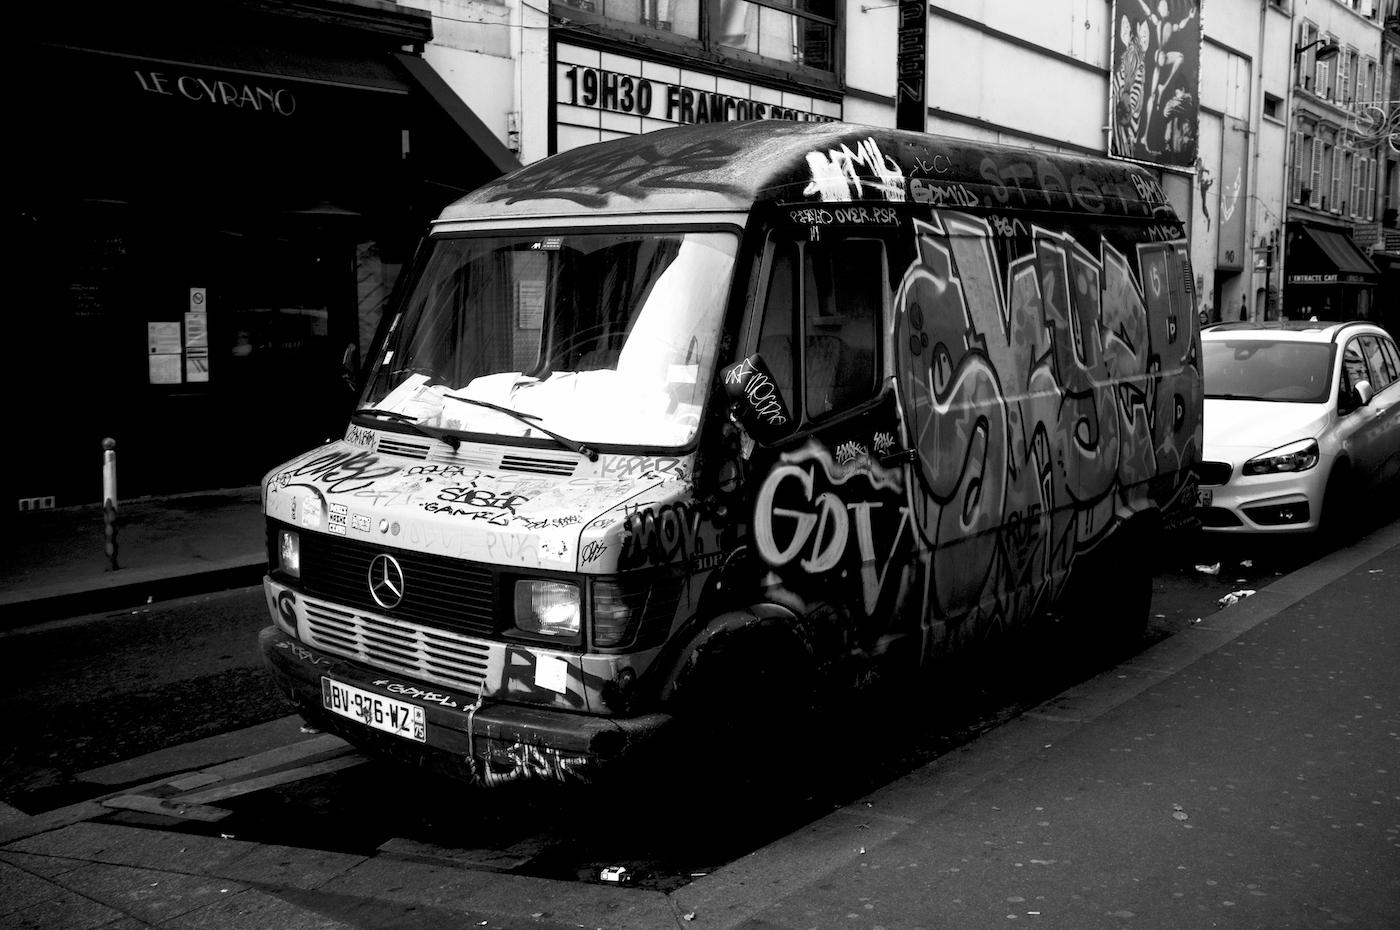 161127-marcvallee-Graffiti-Trucks-27.11.16.0016